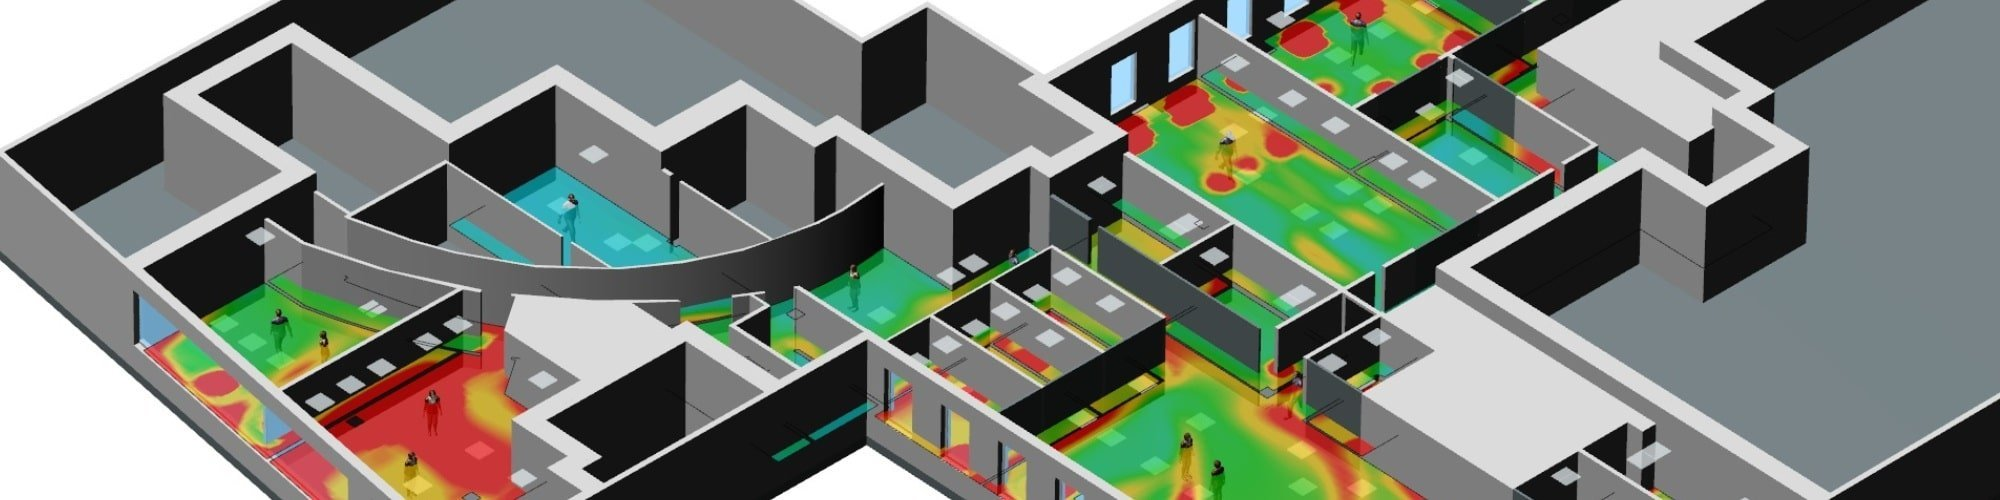 Simulation HVAC, Chauffage, Ventilation, Climatisation